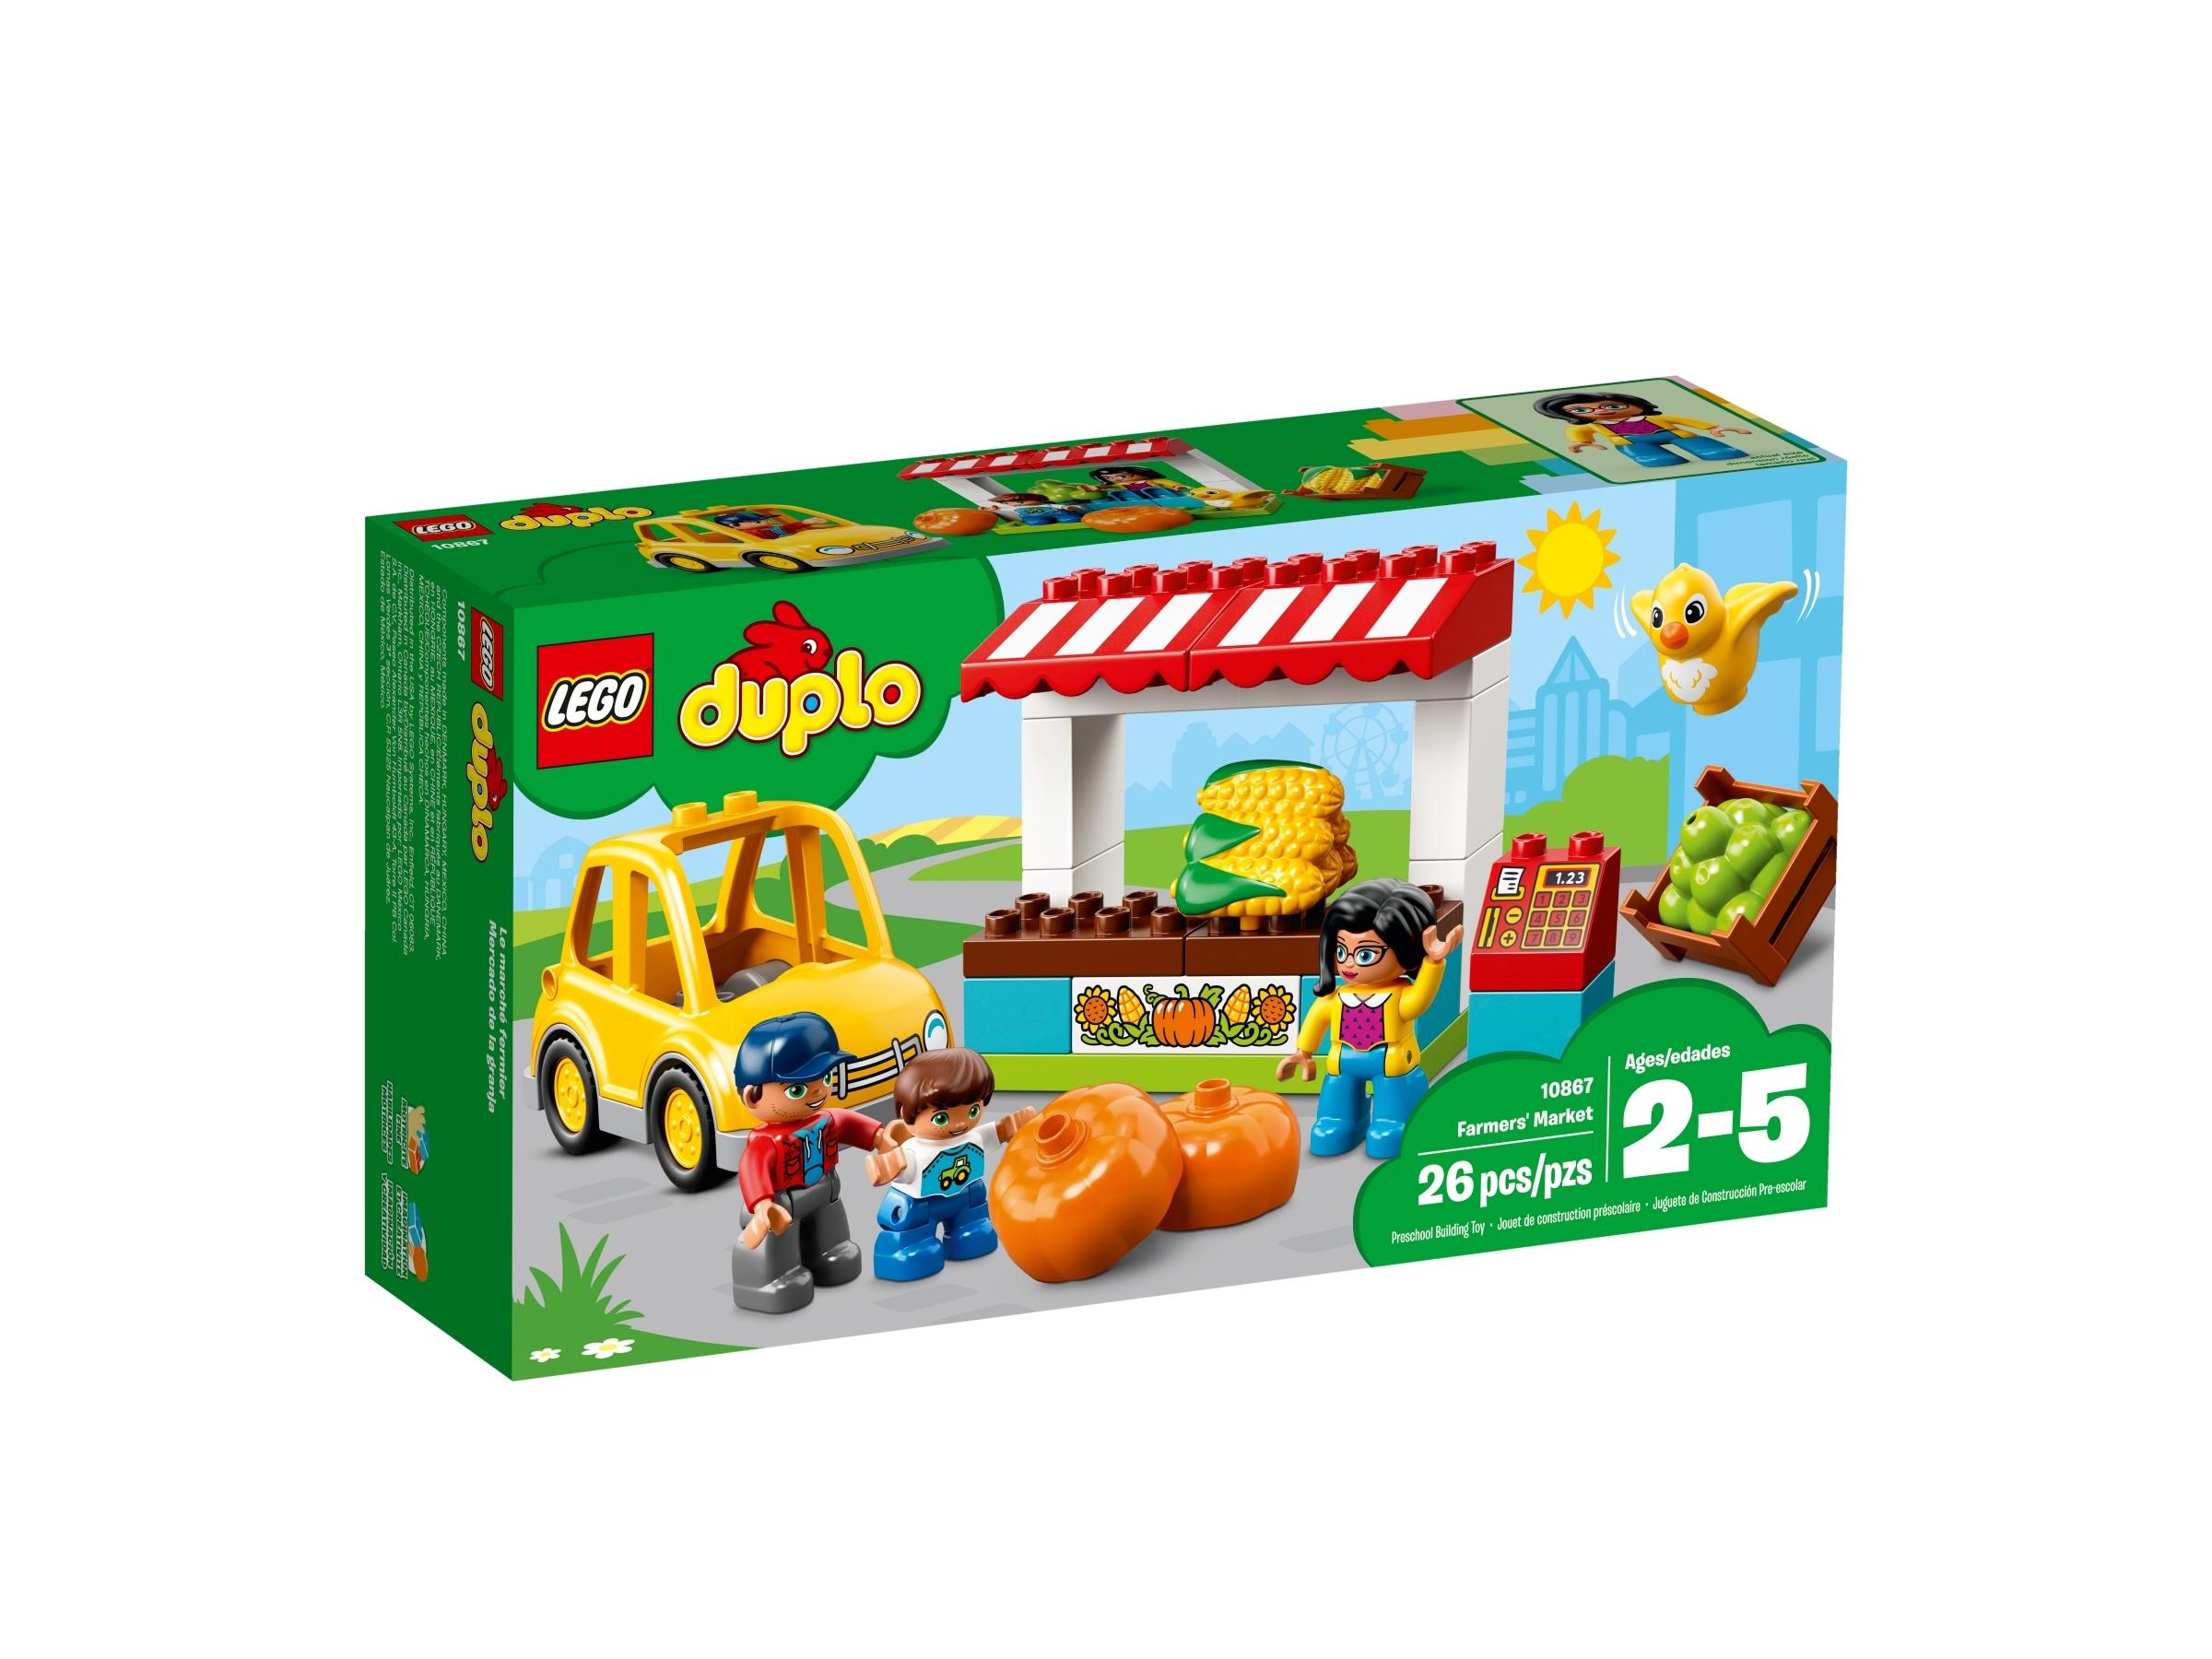 Lego Duplo CORN COBS-Supermarket-Red 1x2 2er High-Motif Stone